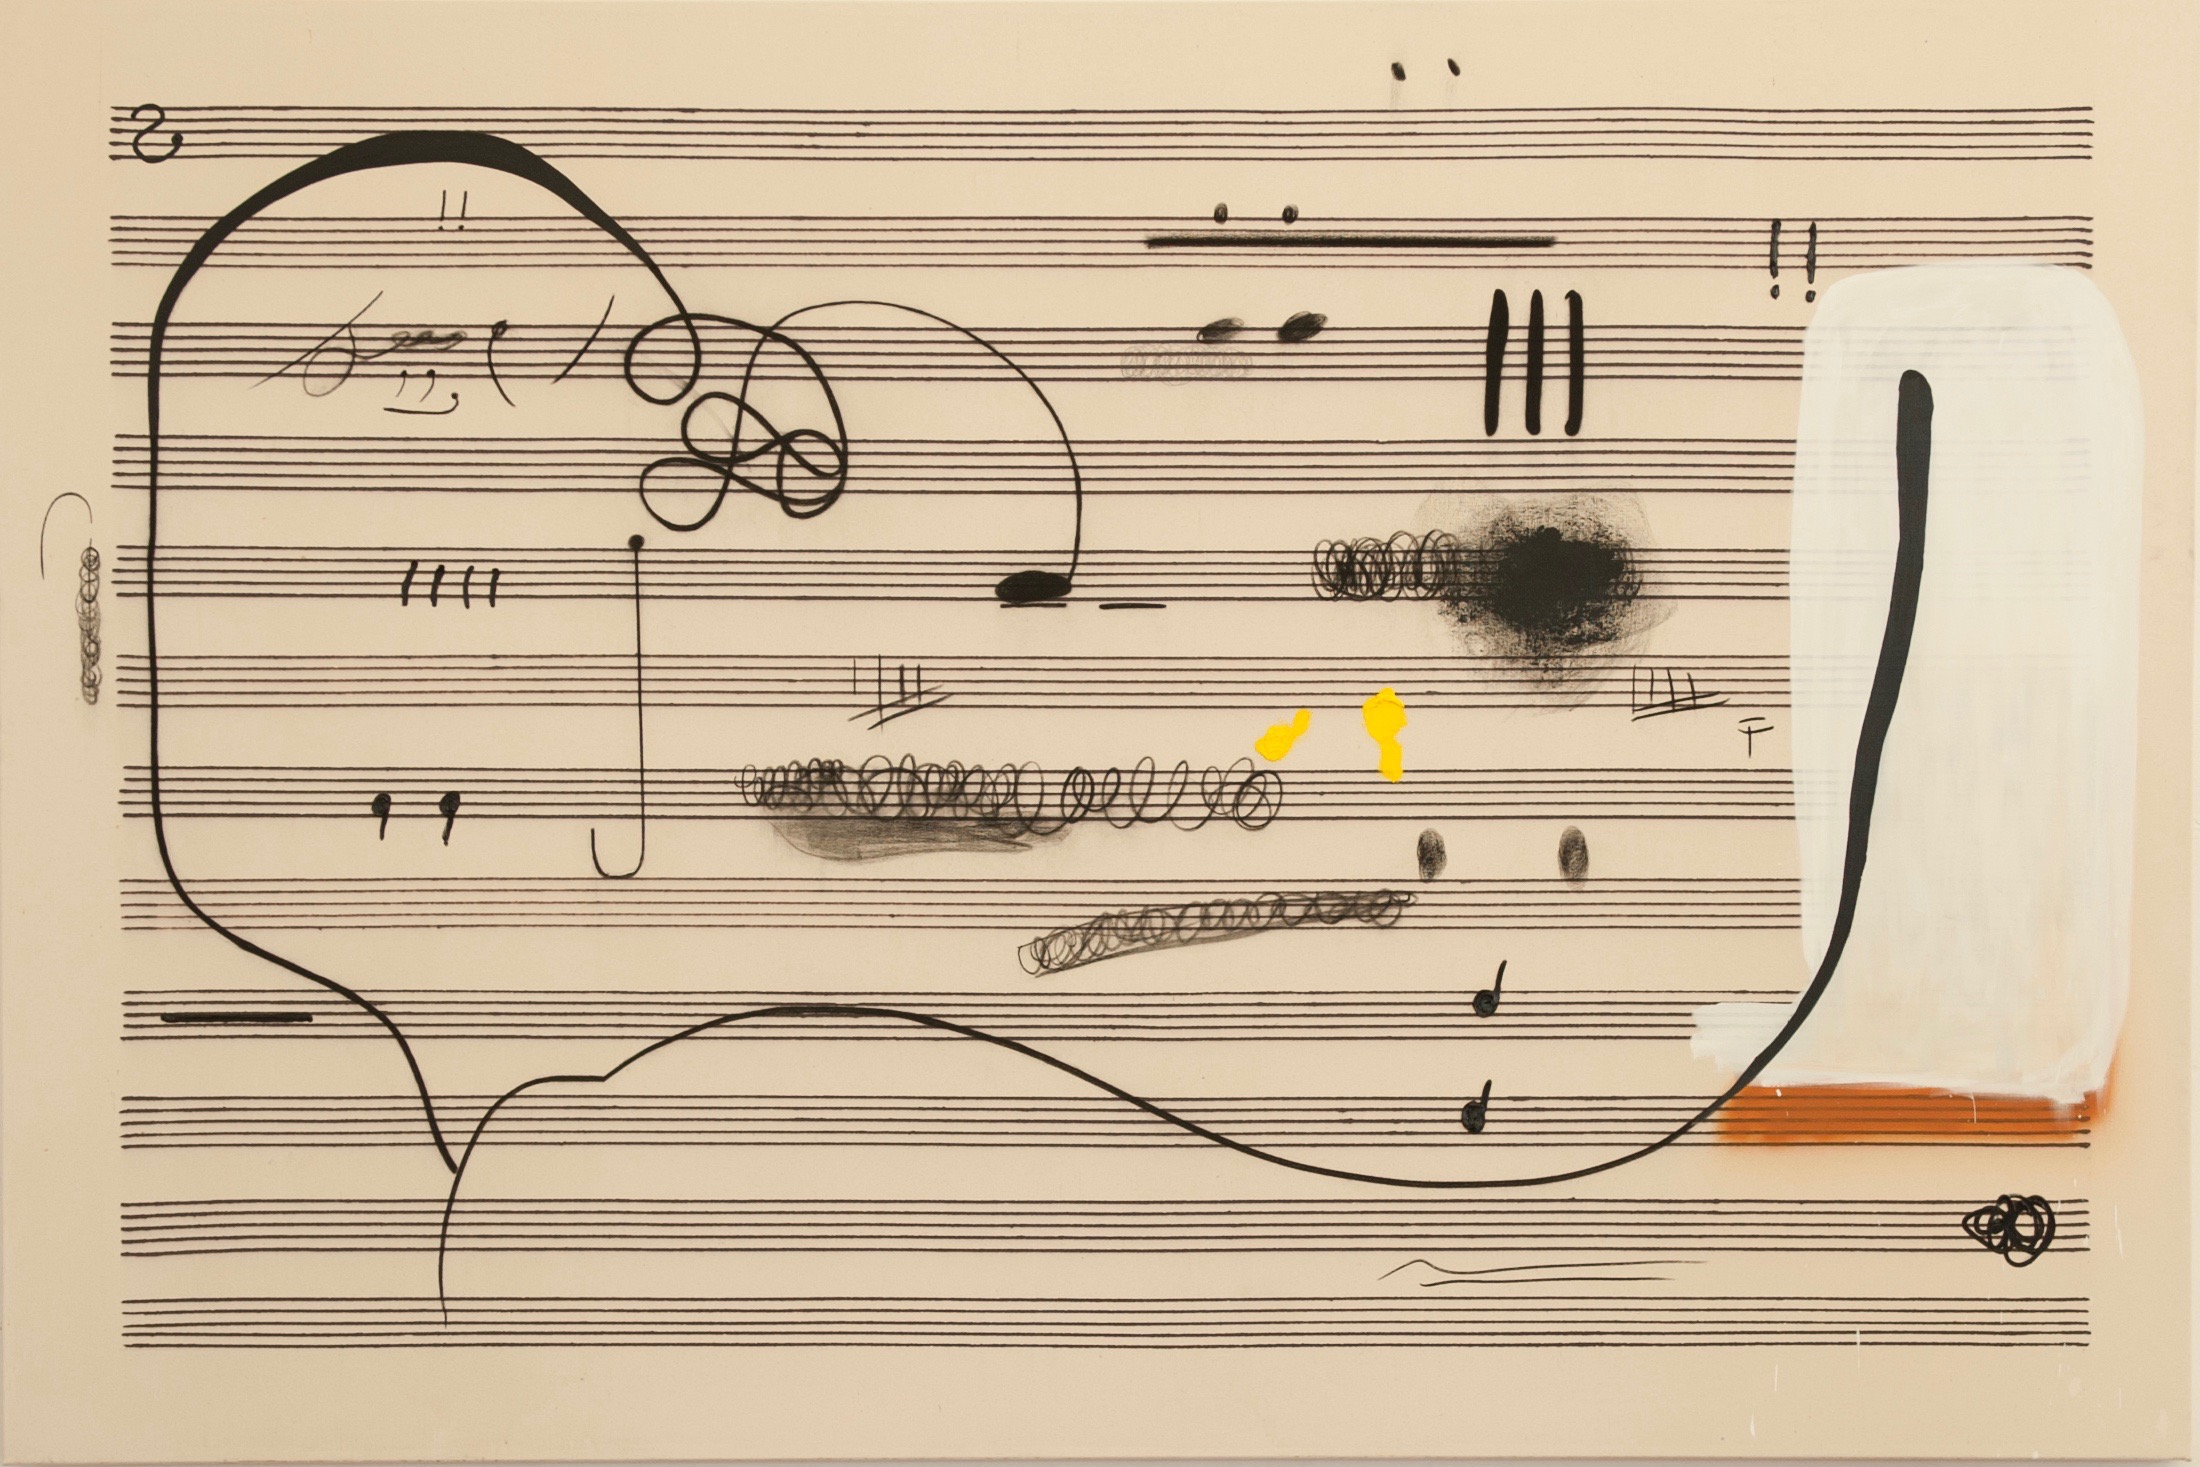 O.T., 200x300cm, Öl, Kohle und Bleistift auf Leinwand, Christian Rosa, 2015 Courtesy Galerie Meyer Kainer